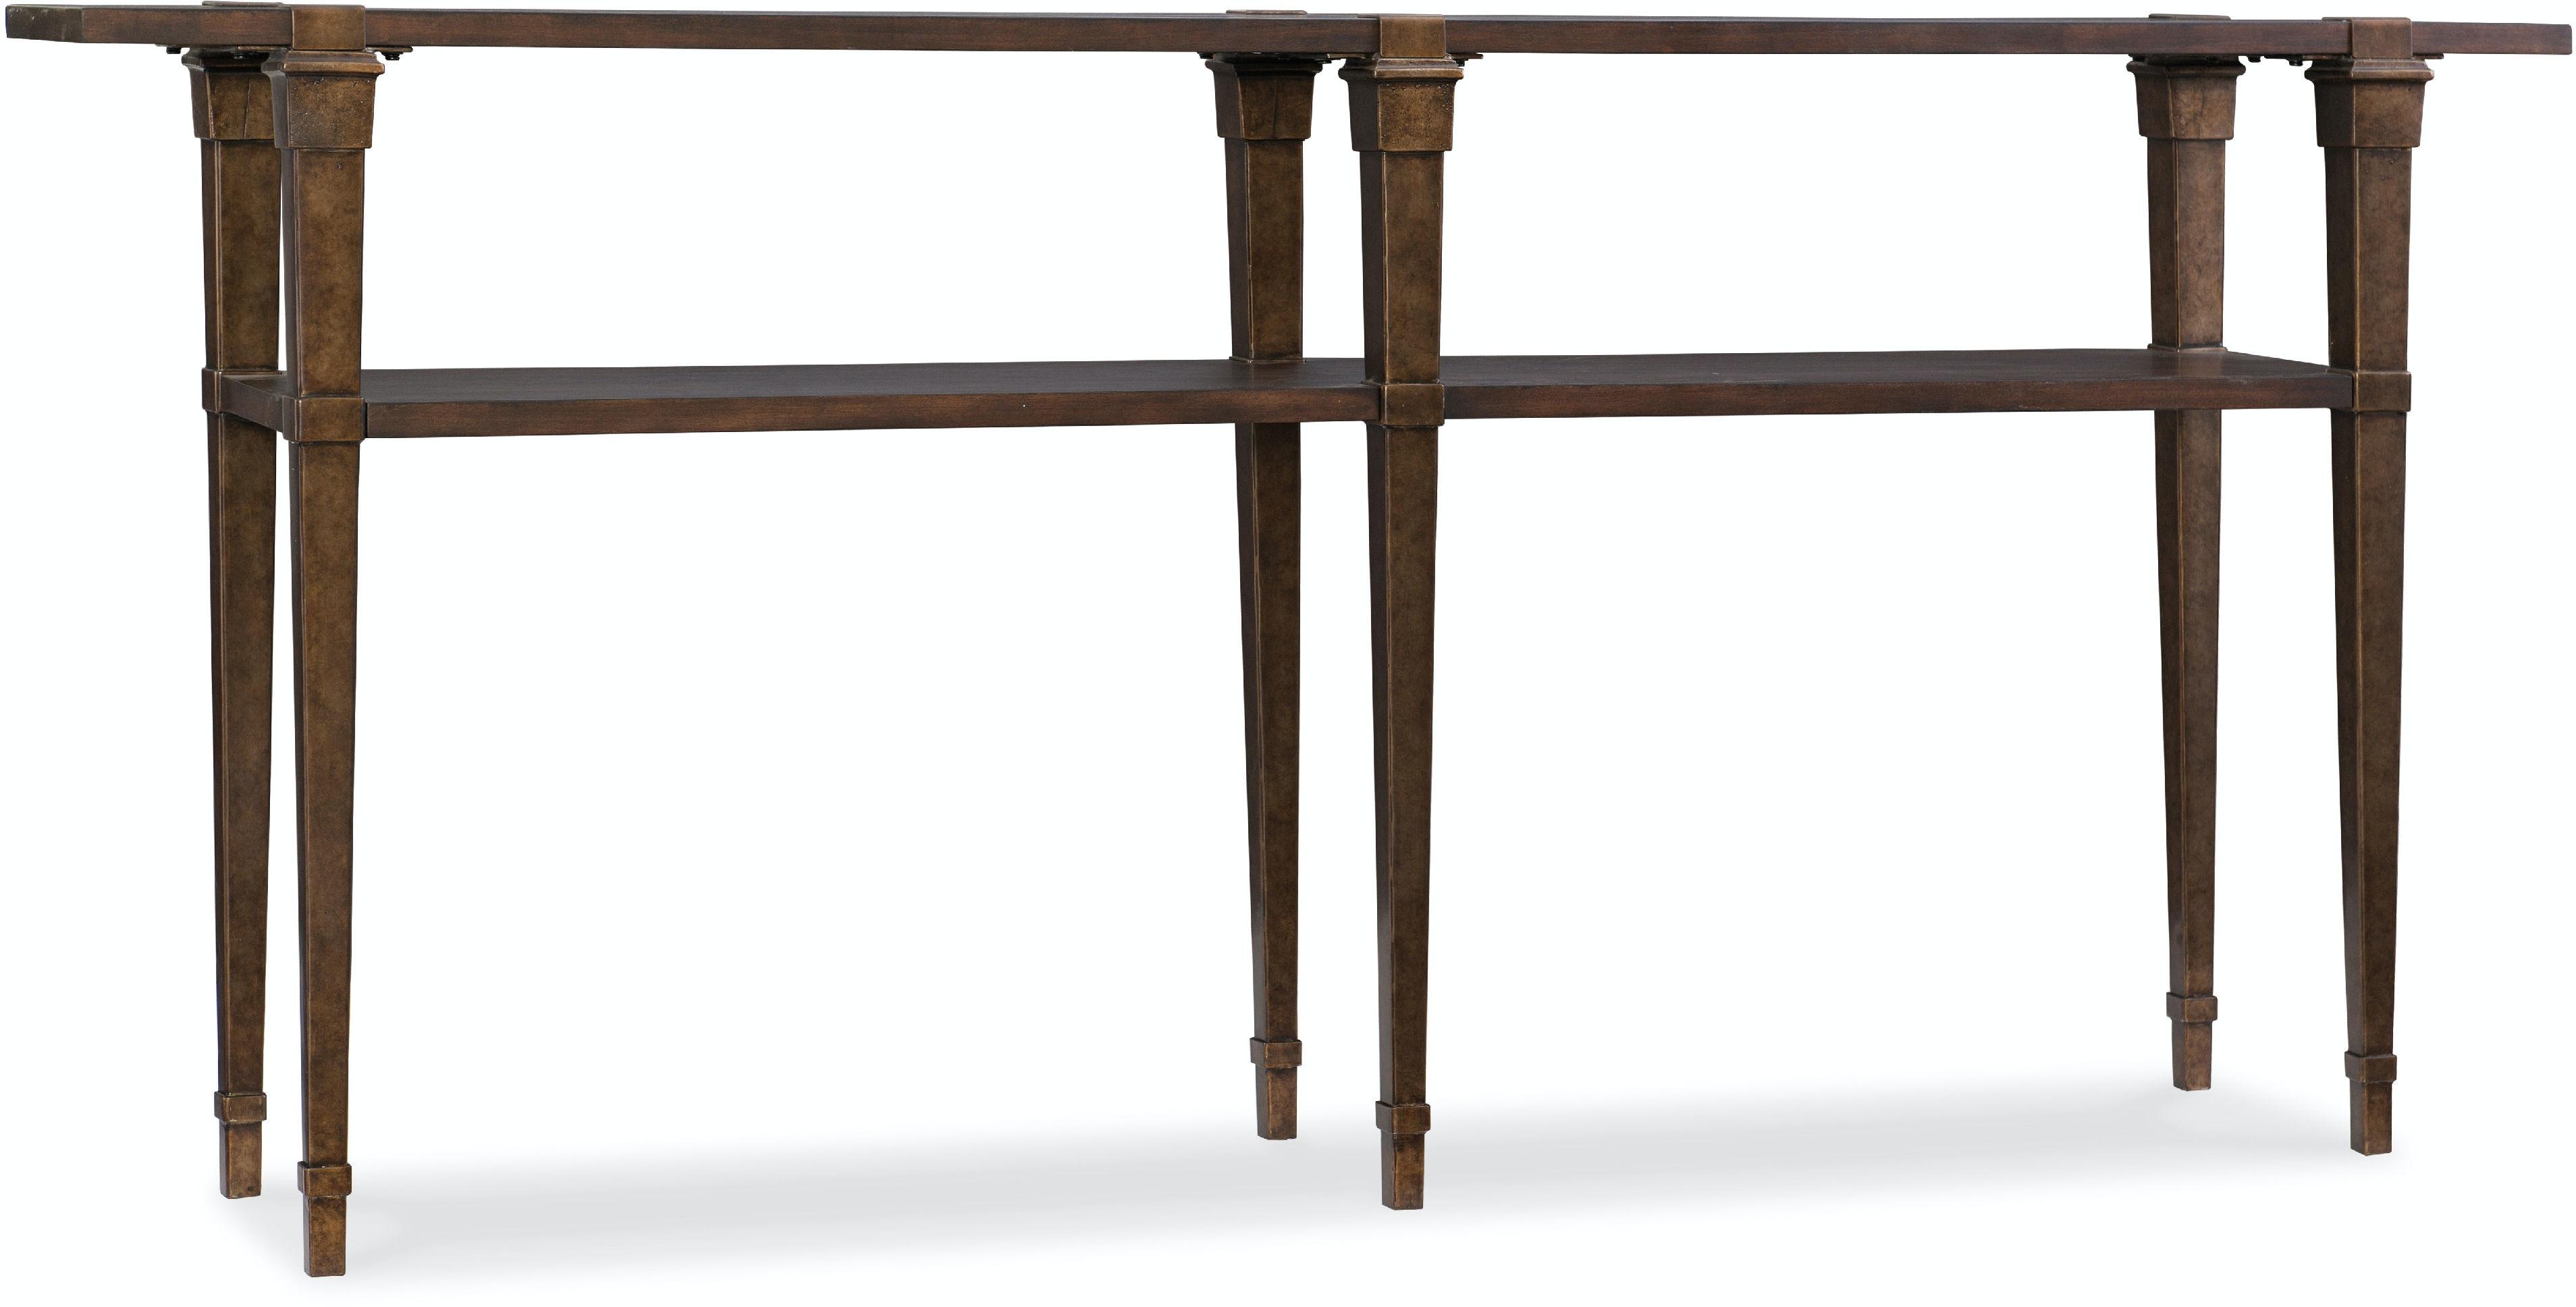 hooker furniture living room skinny console table dkw - hooker furniture skinny console table dkw